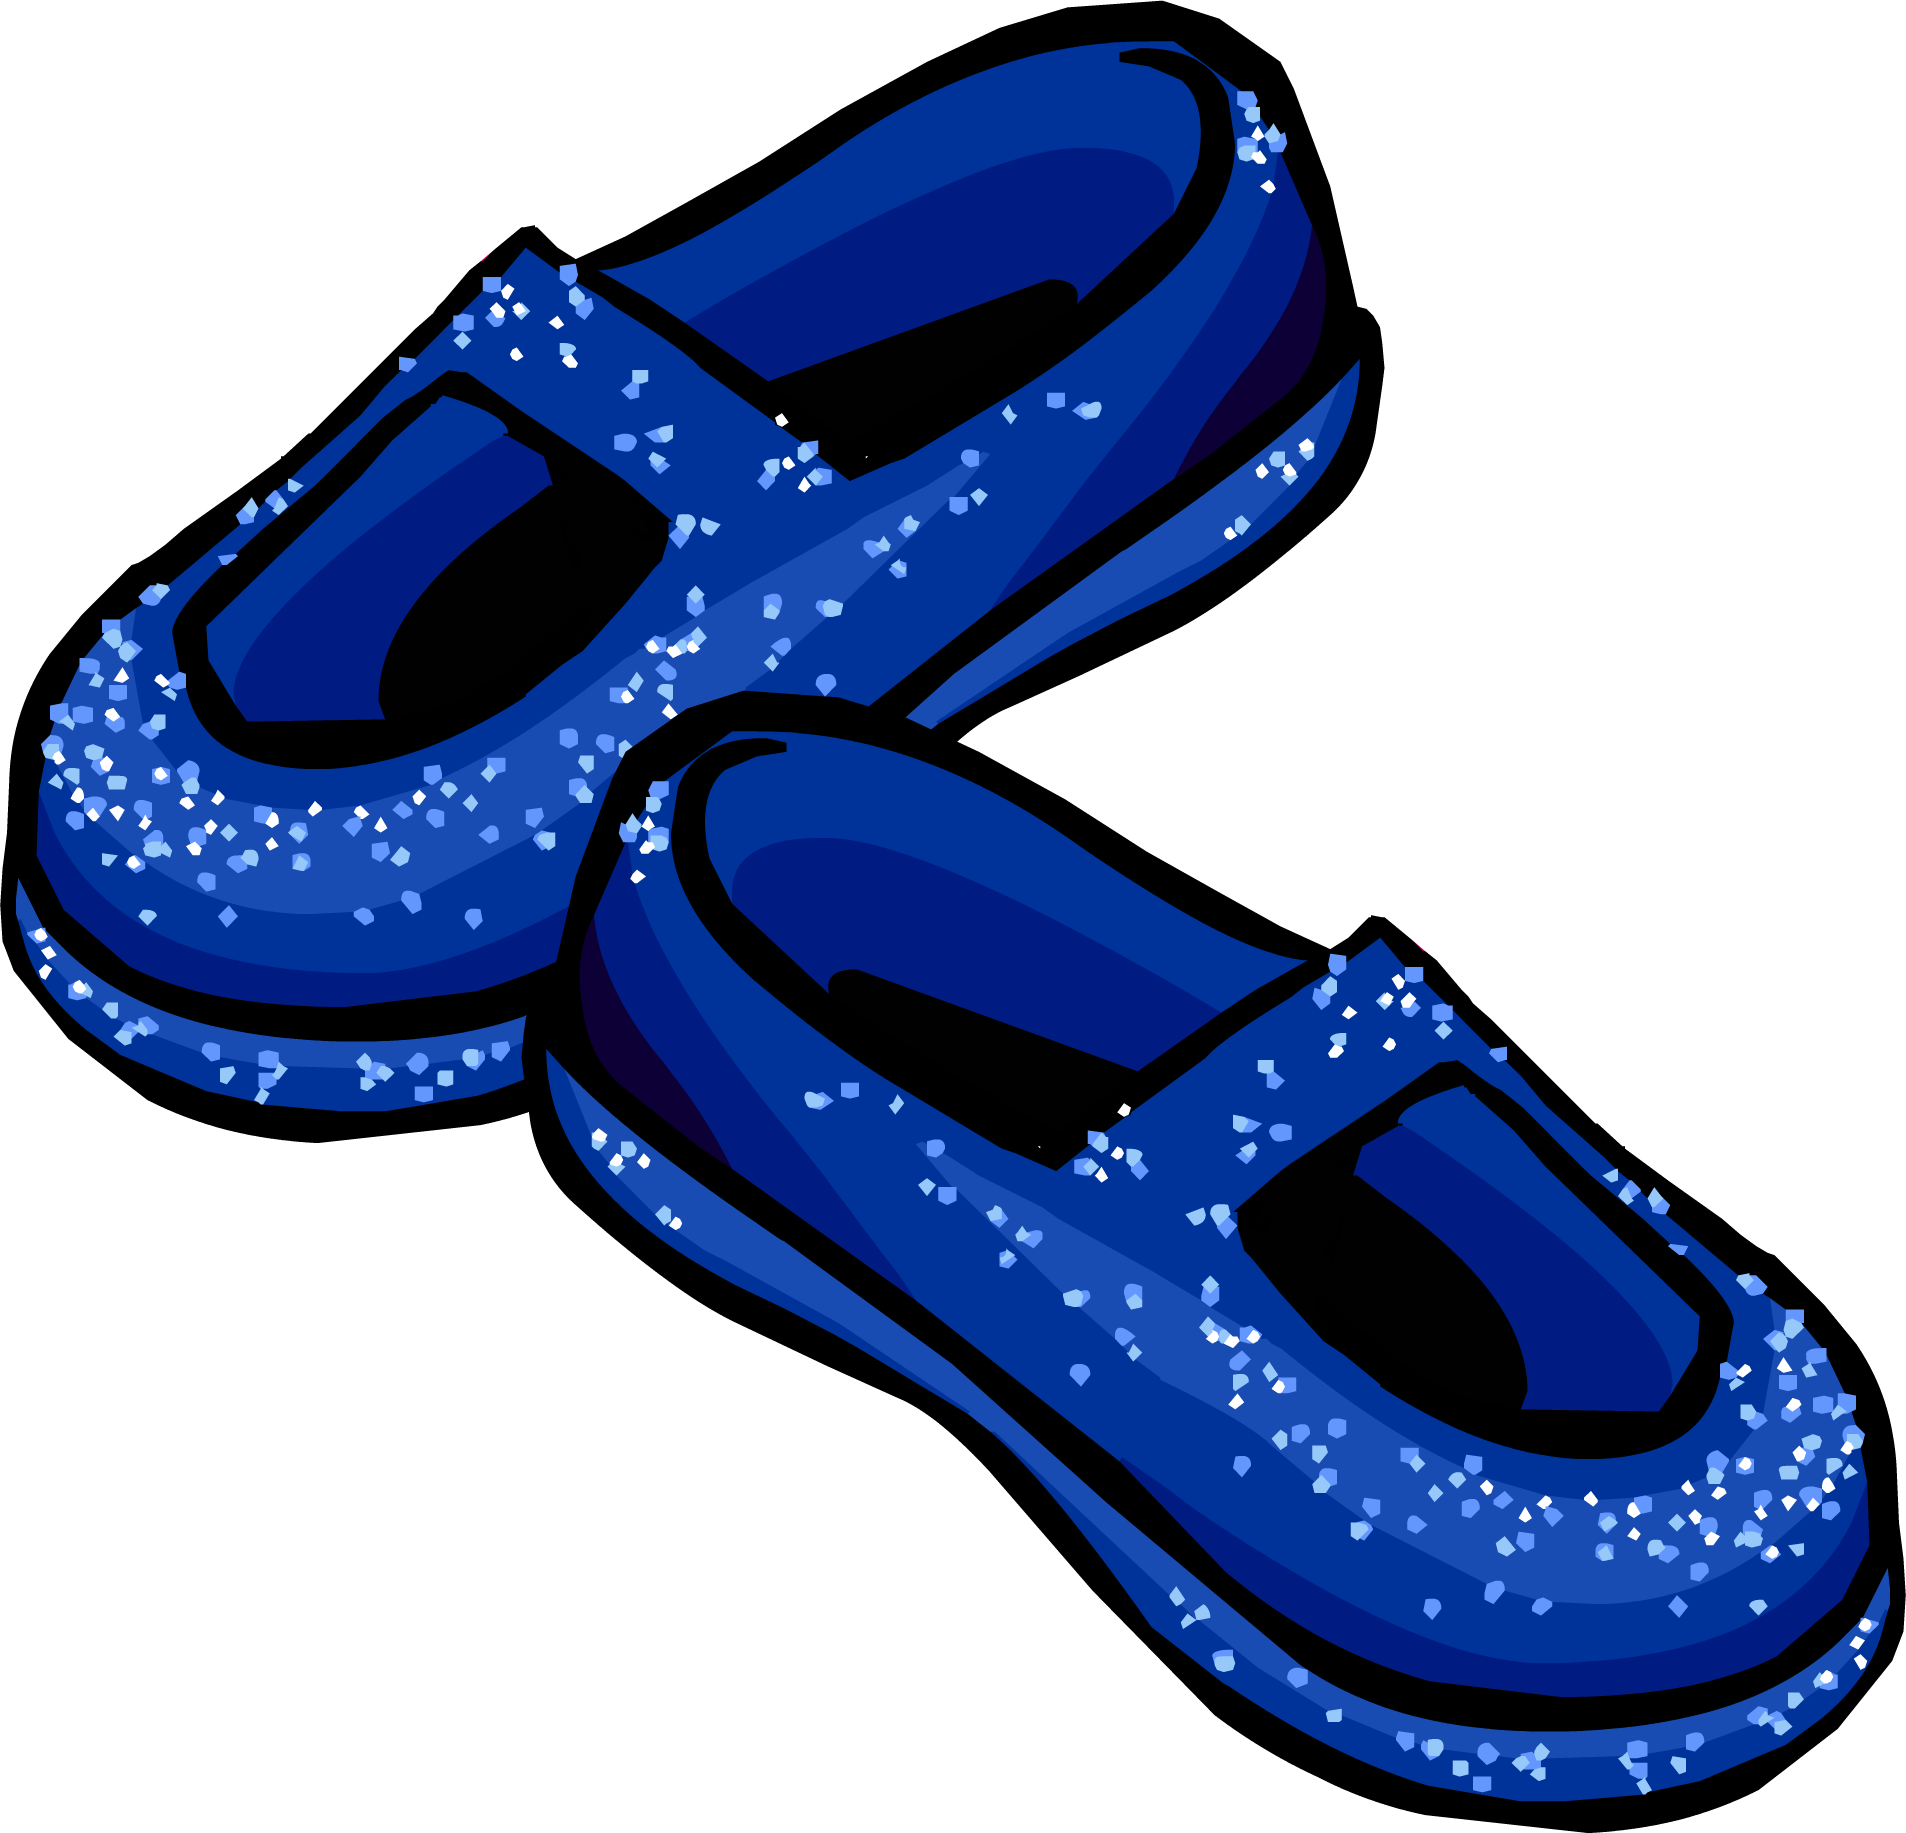 Blue Sparkly Shoes Club Penguin